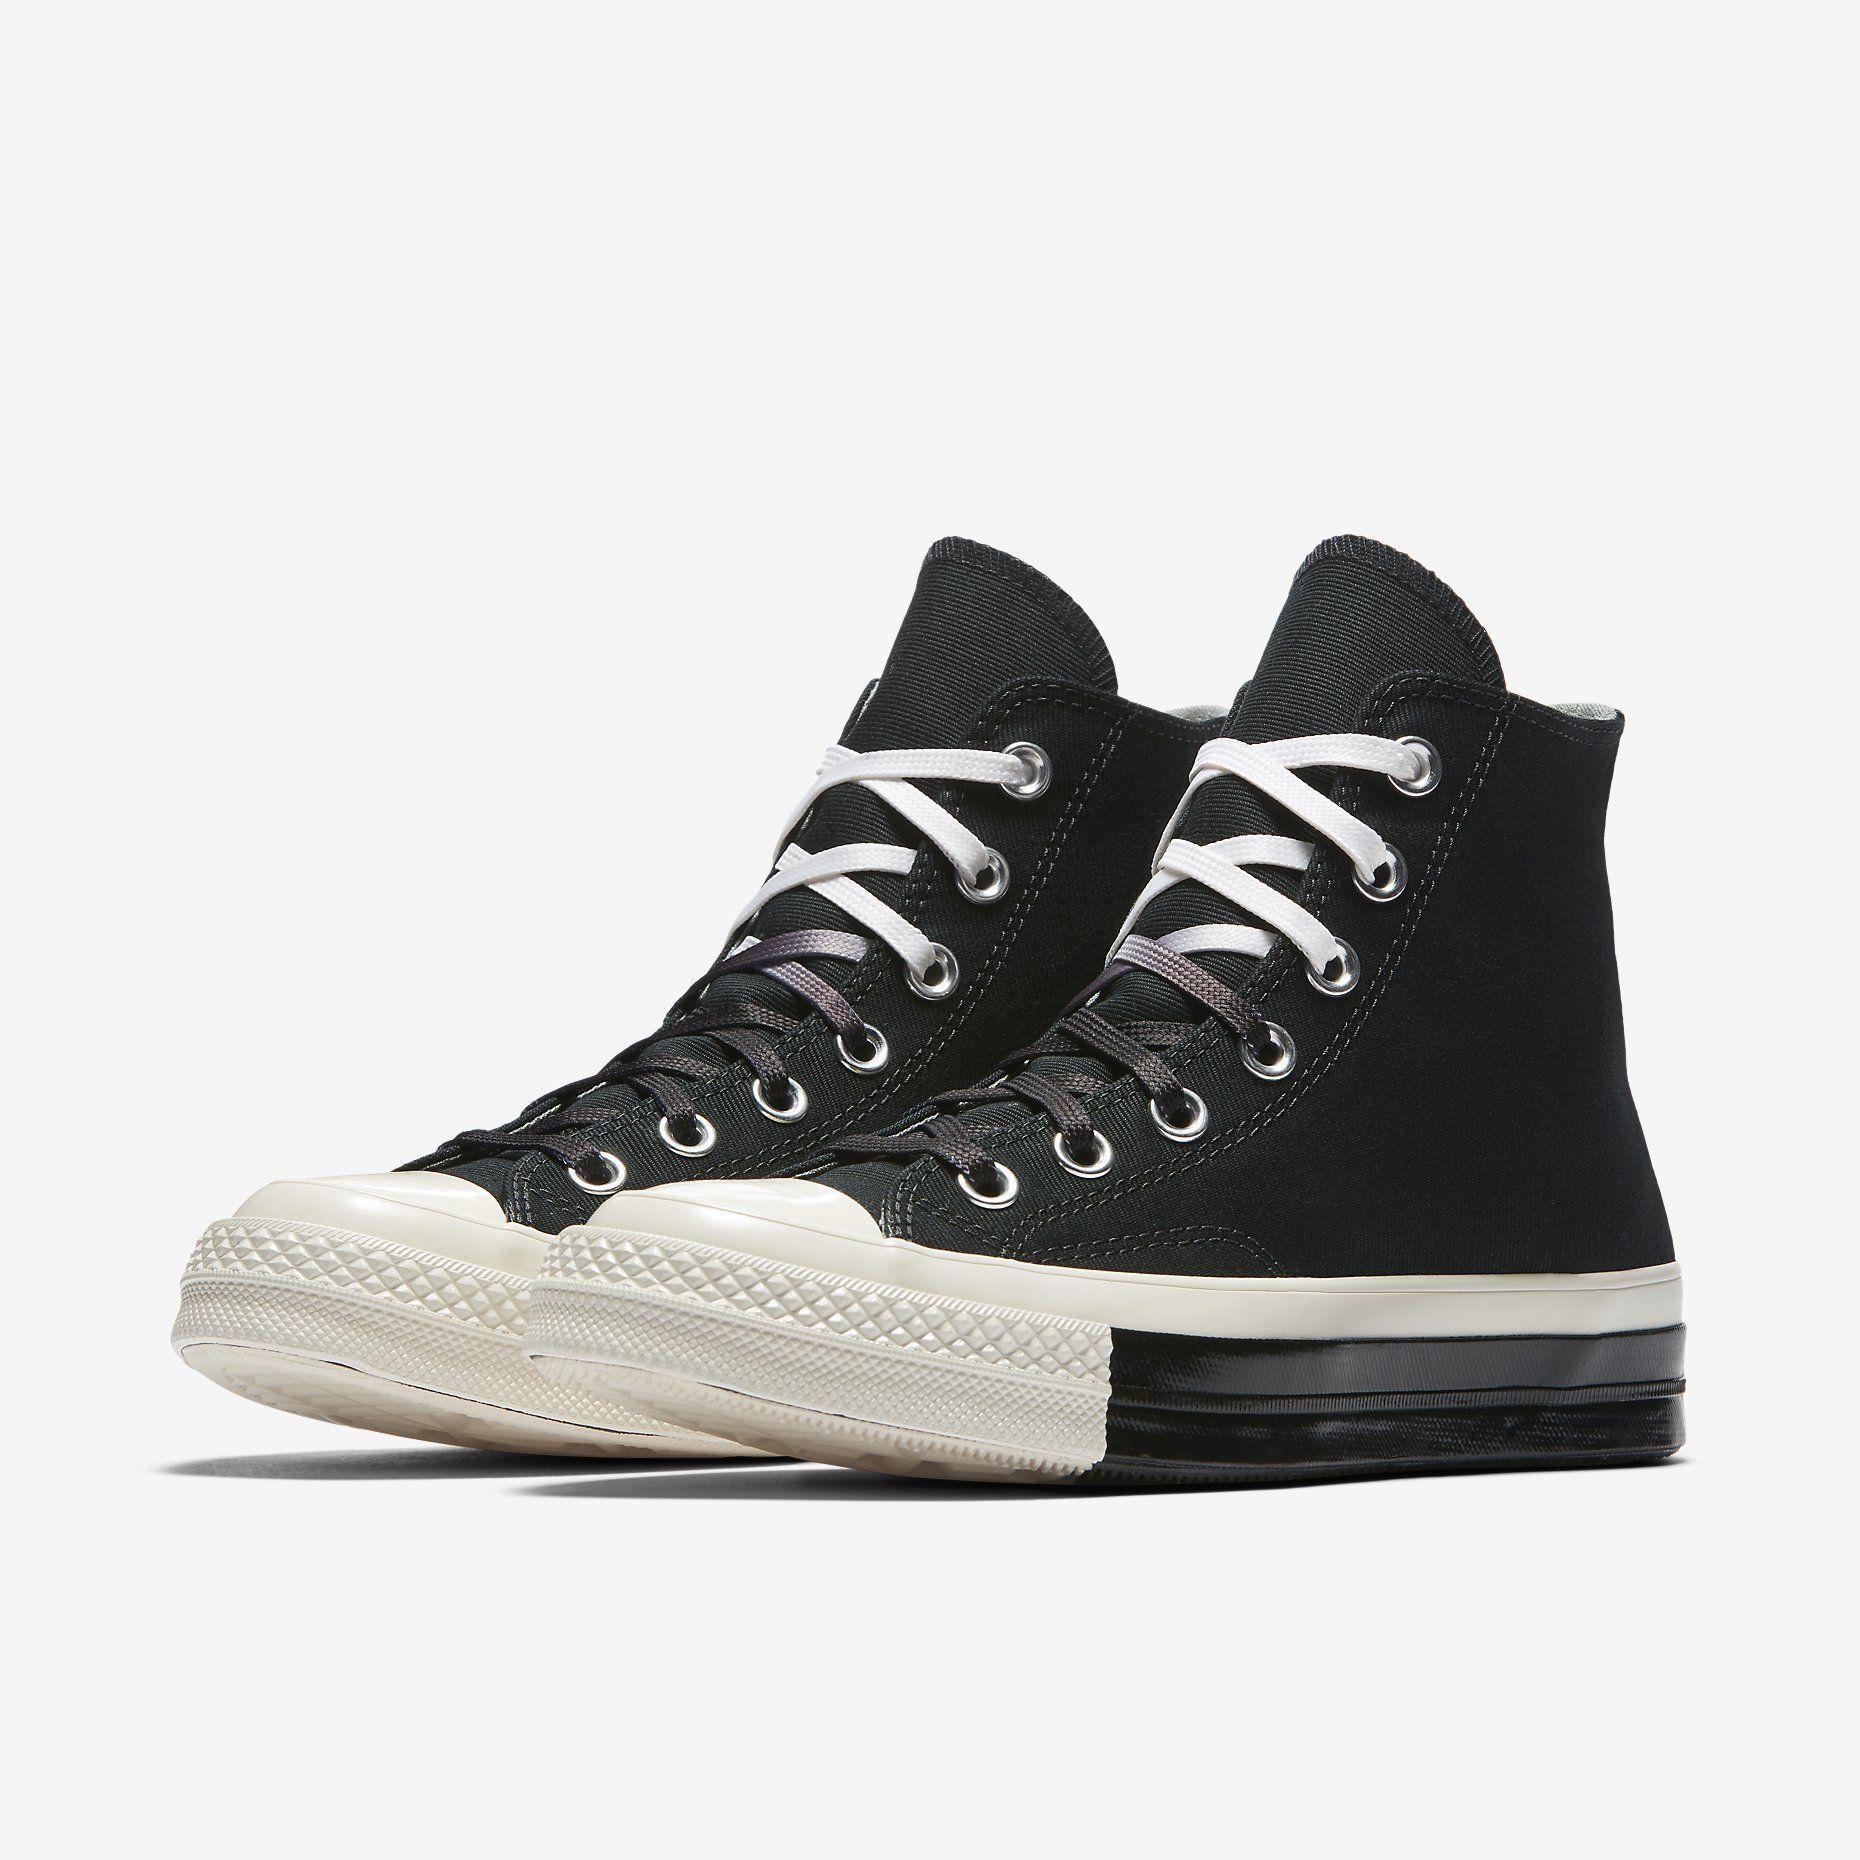 size 40 08c84 48f78 Converse Chuck 70 Super Color-Block High Top Women's Shoe ...